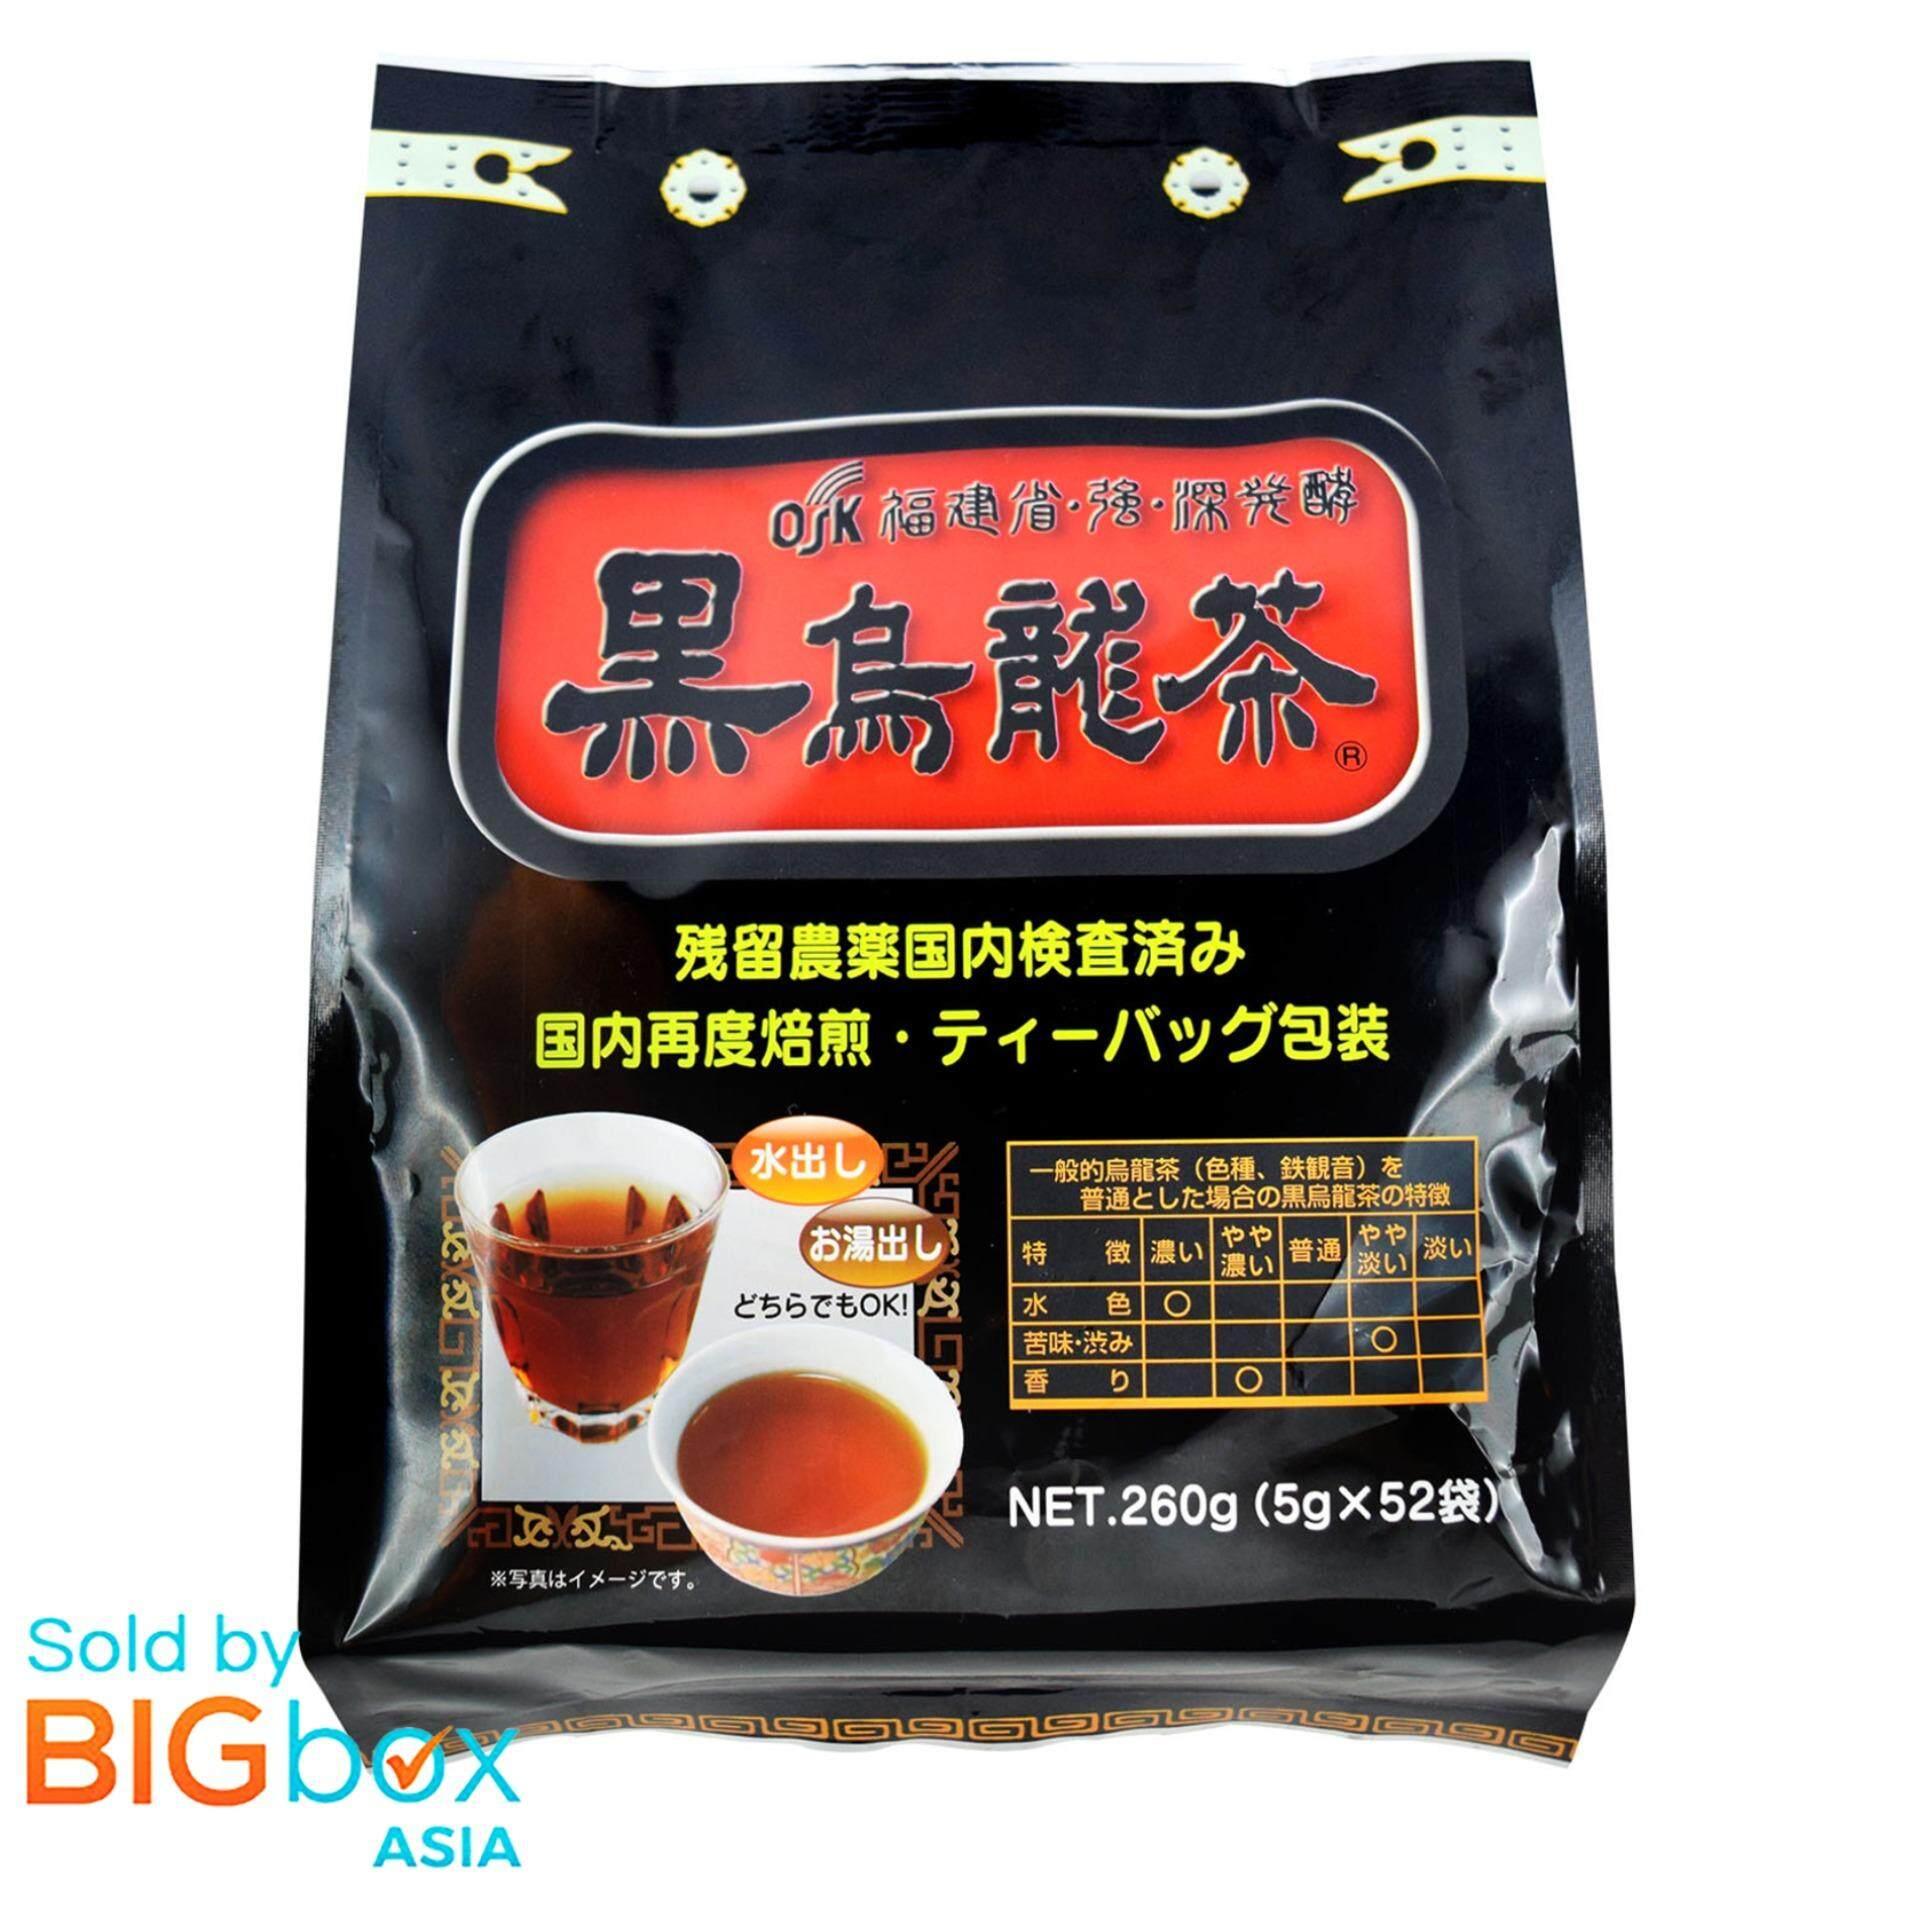 Osk Black Oolong Tea 5g X 52 Packs - Japan By Bigbox Asia.